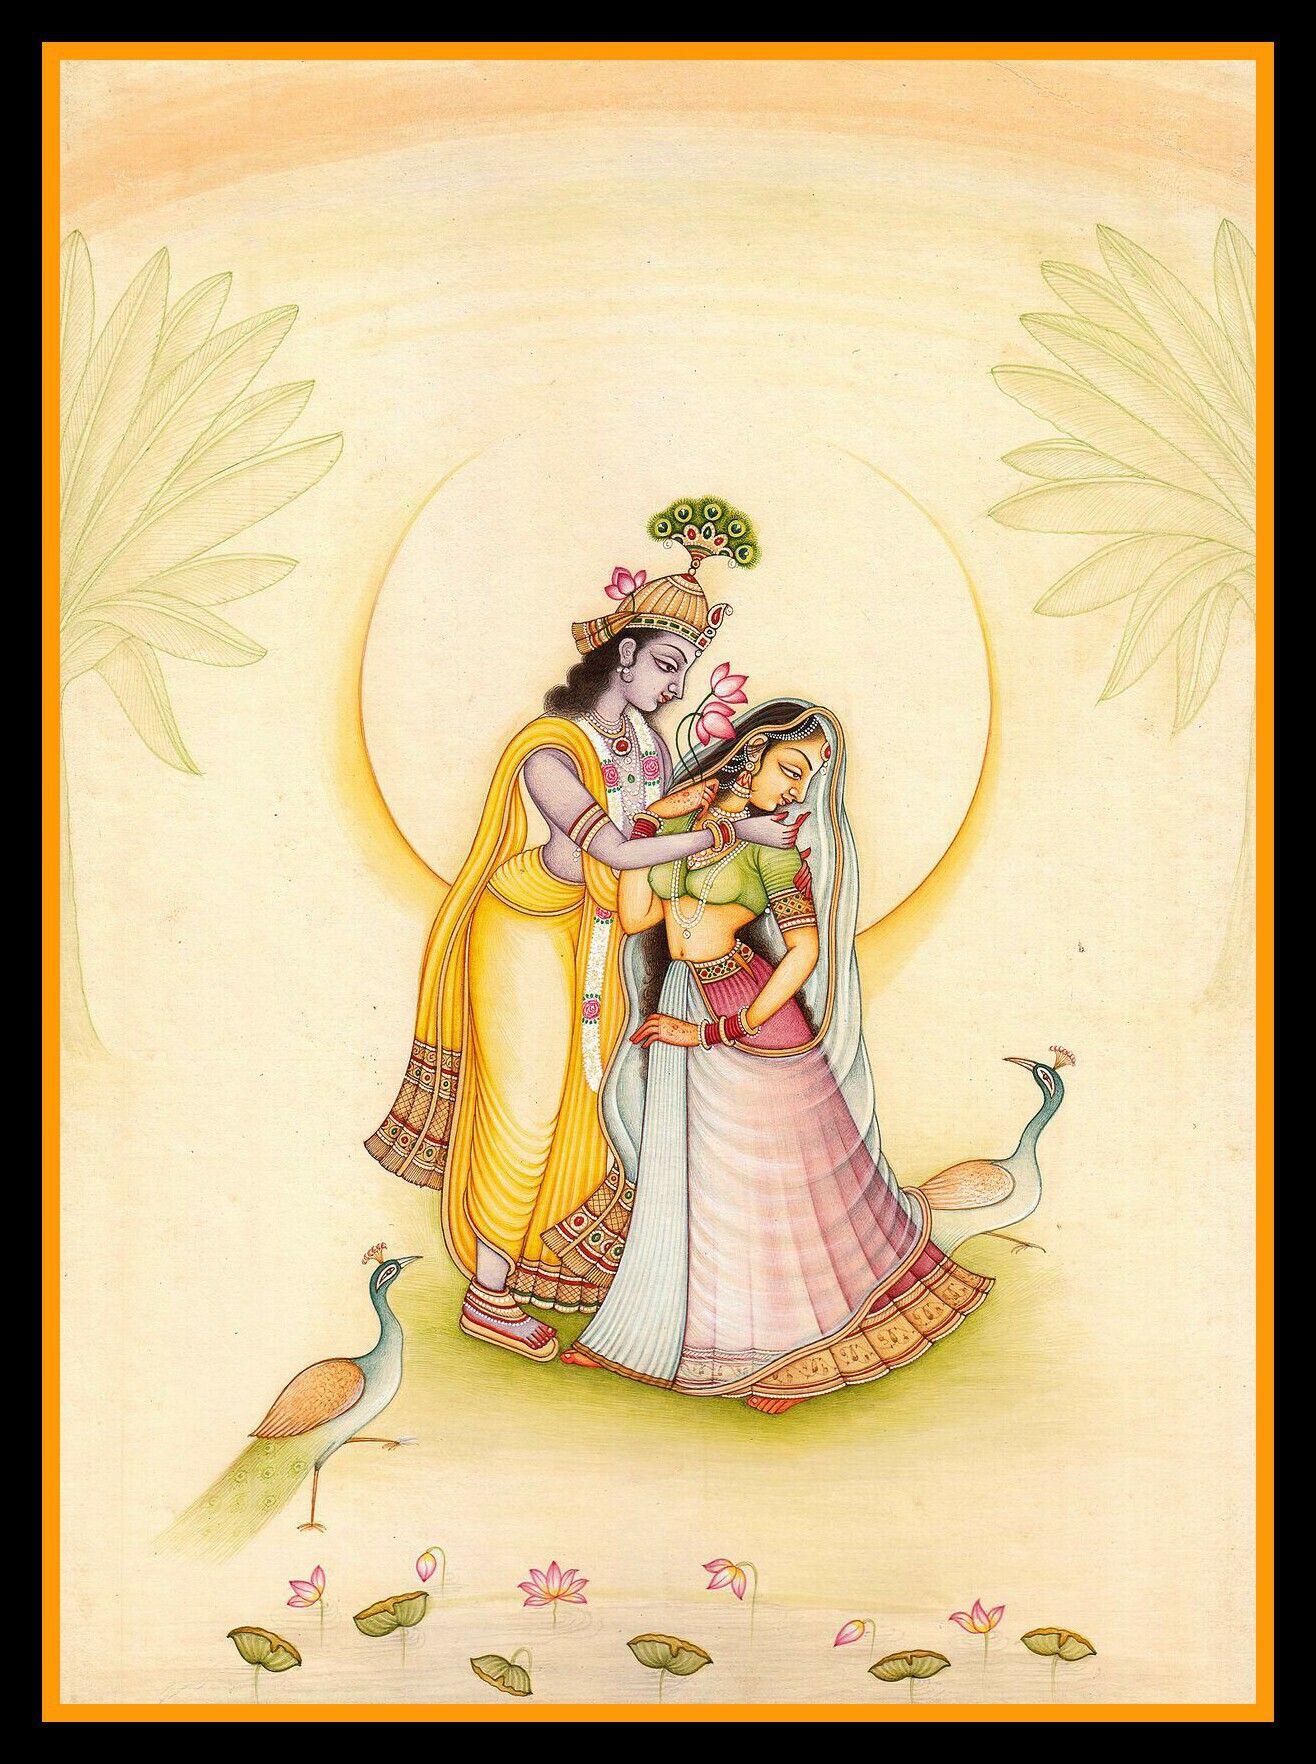 Pin by Vinod Patel on Radhe Krishna | Pinterest | Radhe krishna and ...